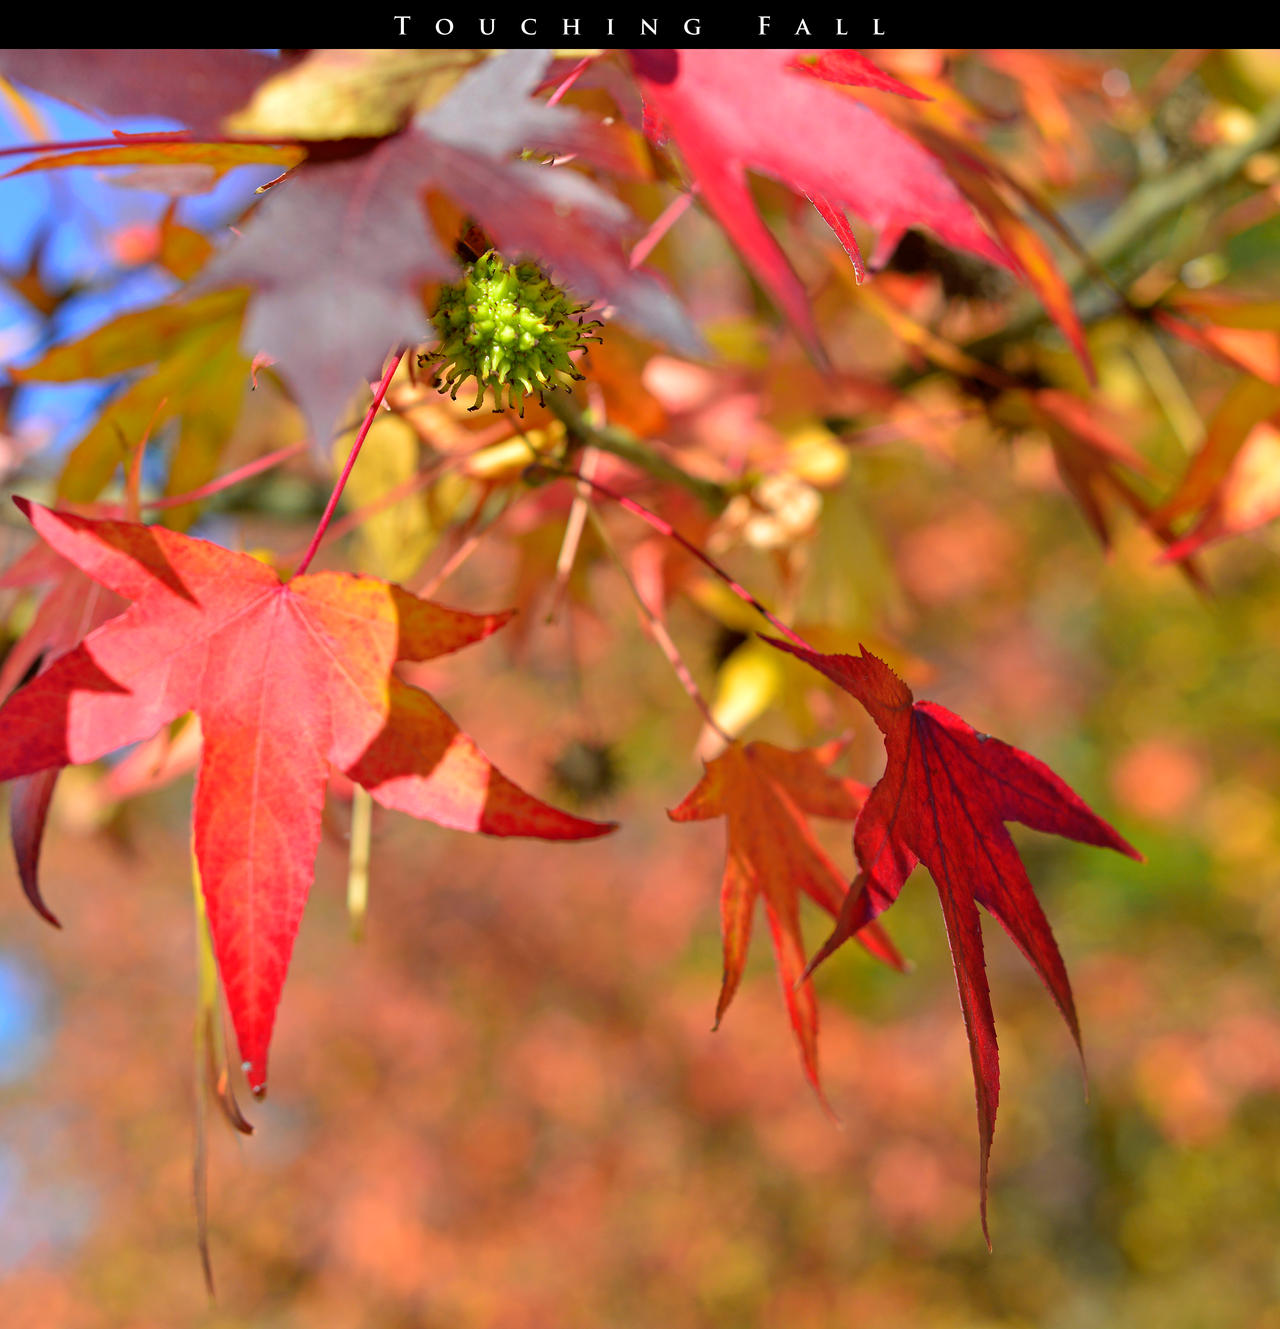 Touching Fall 11